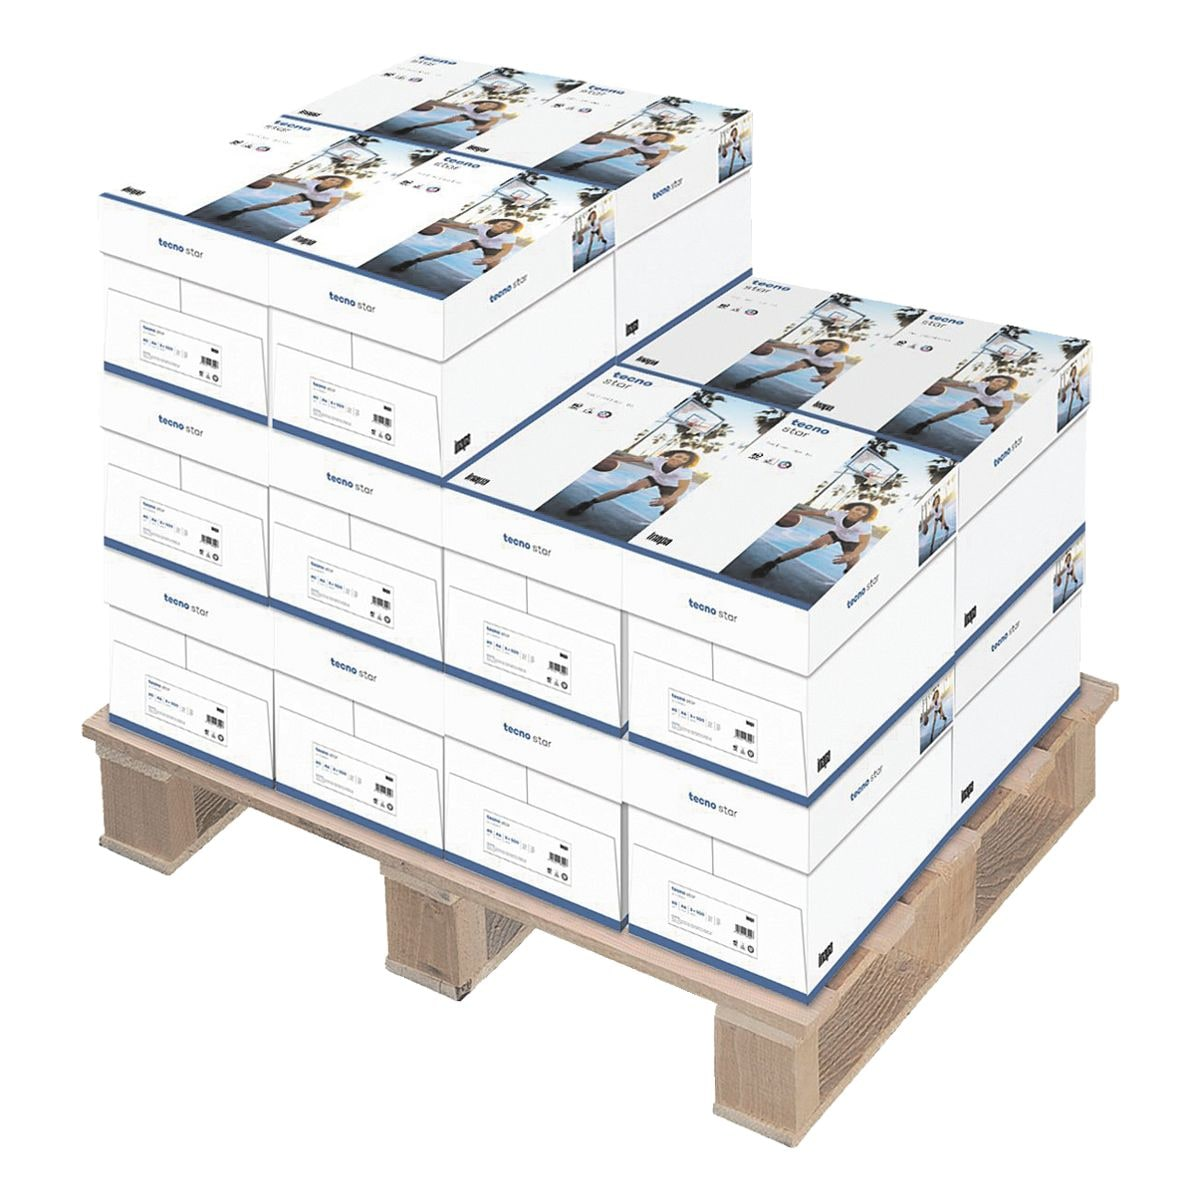 100x Kopierpapier A4 Inapa tecno Star - 50000 Blatt gesamt, 80g/qm